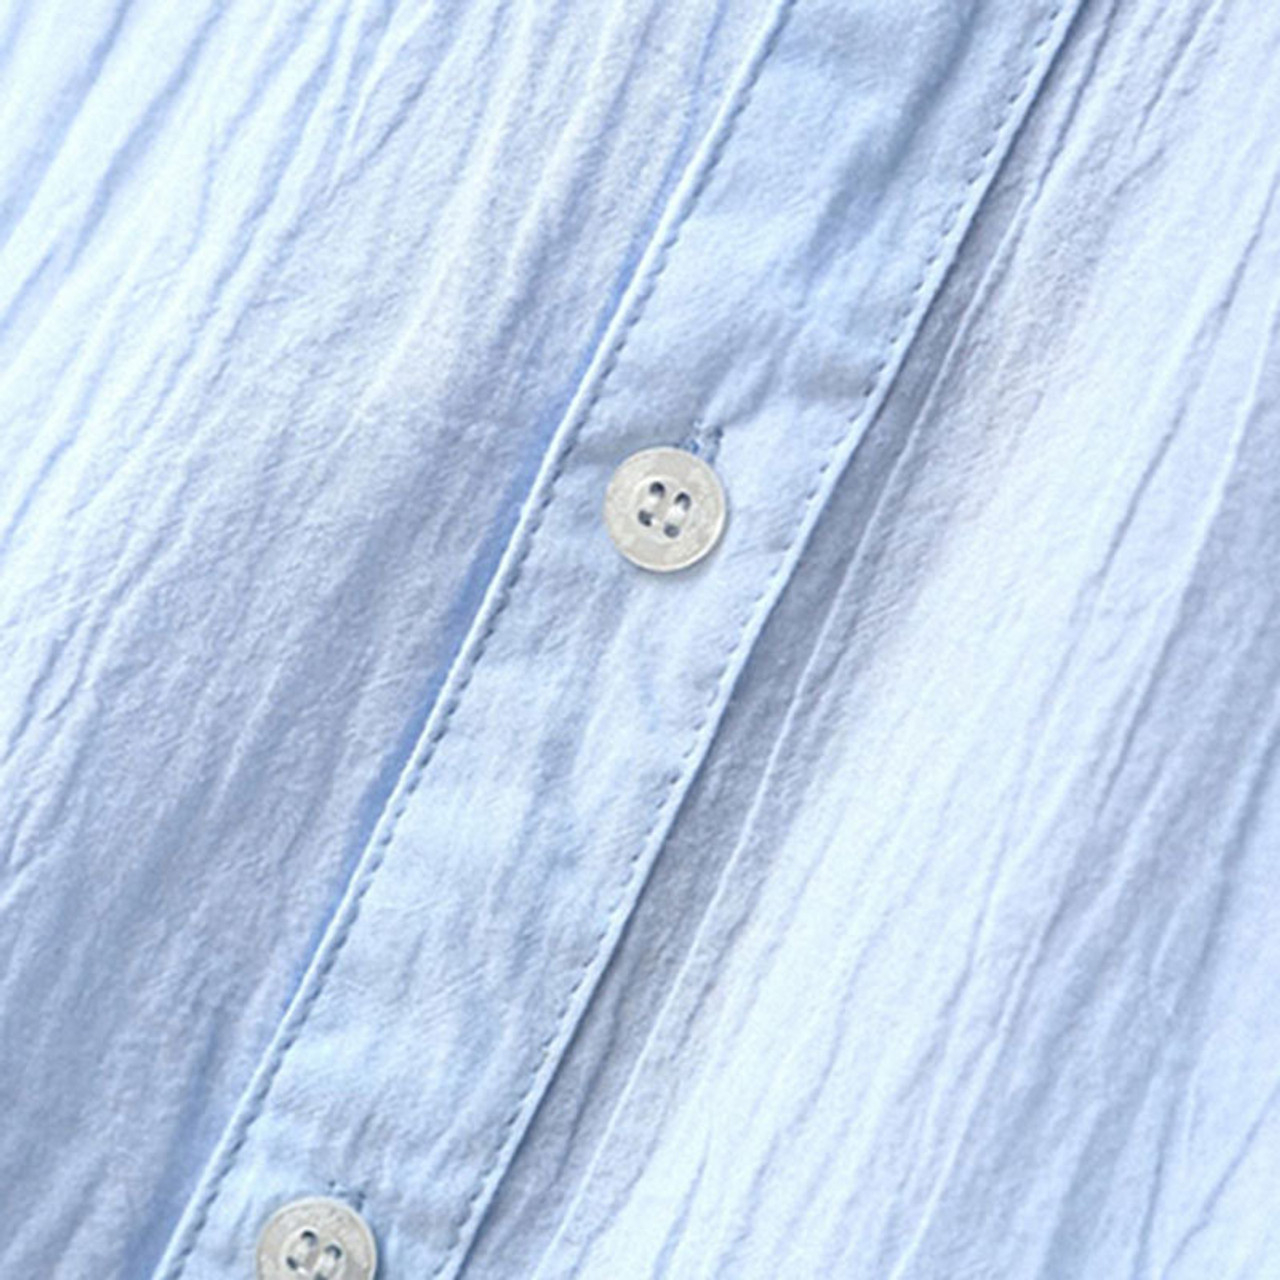 c36d0522c3f5a ... Plus Size Shirts Cotton Linen Men Shirt Long Sleeve Summer Style  Hawaiian Shirts Sexy Slim Fit ...